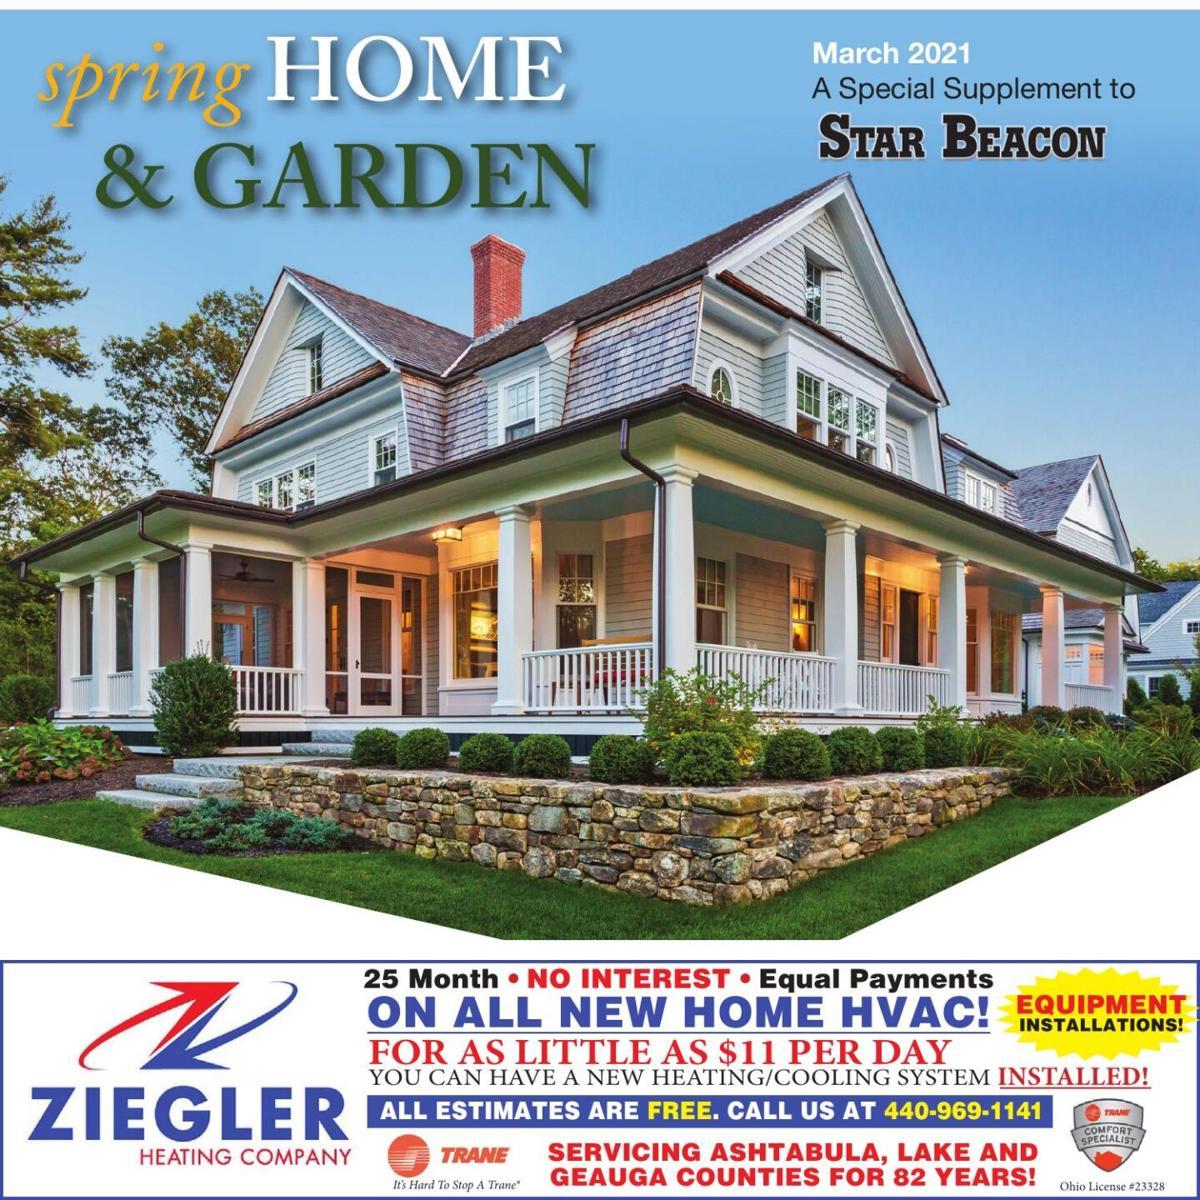 HOME & GARDEN - MARCH 2021